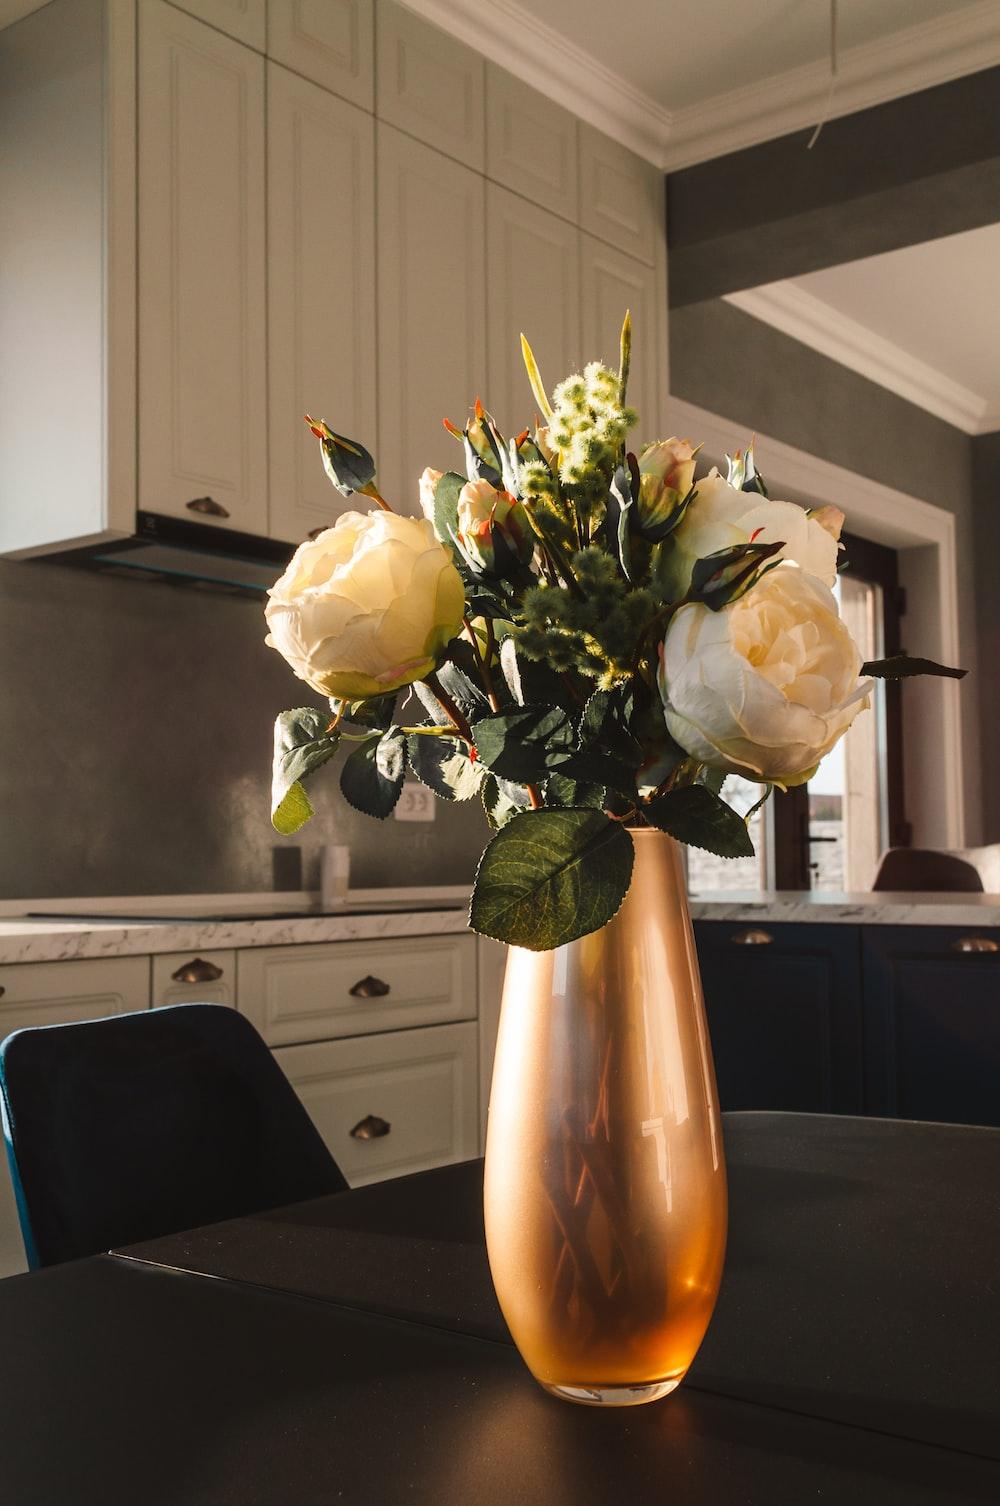 white roses in yellow vase